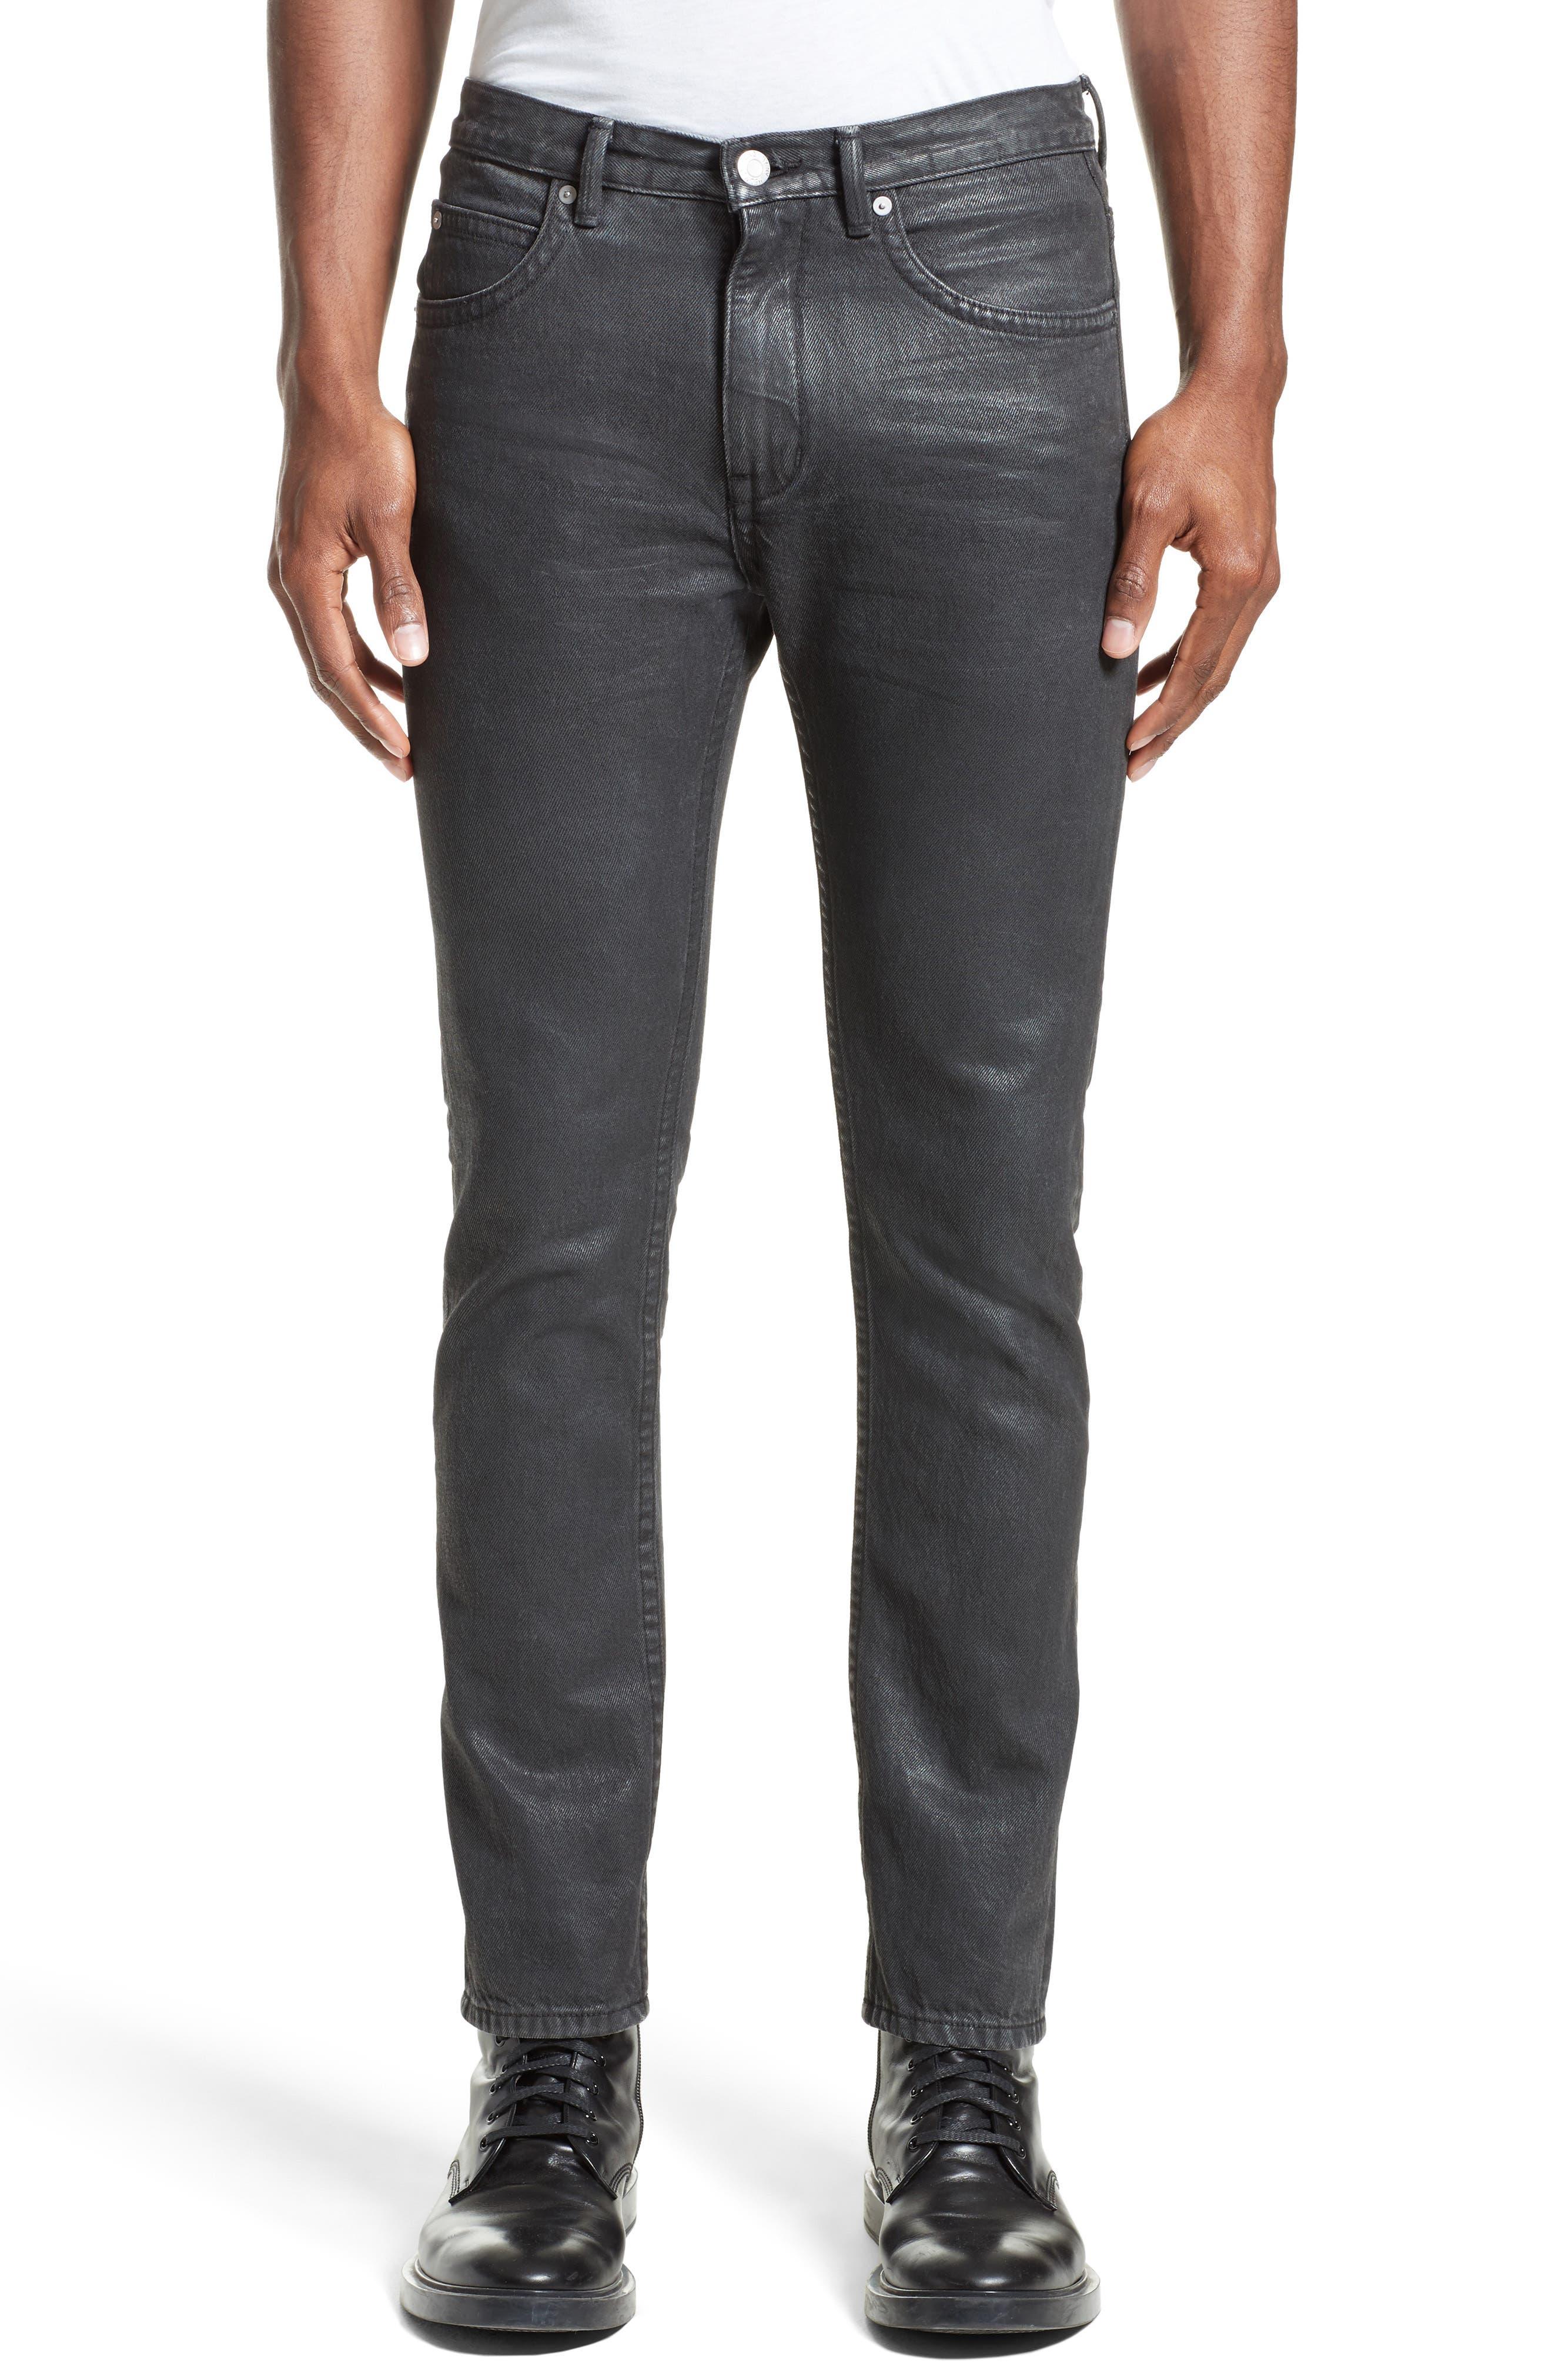 Helmut Lang MR 87 Jeans (Eclipse Exhaust)